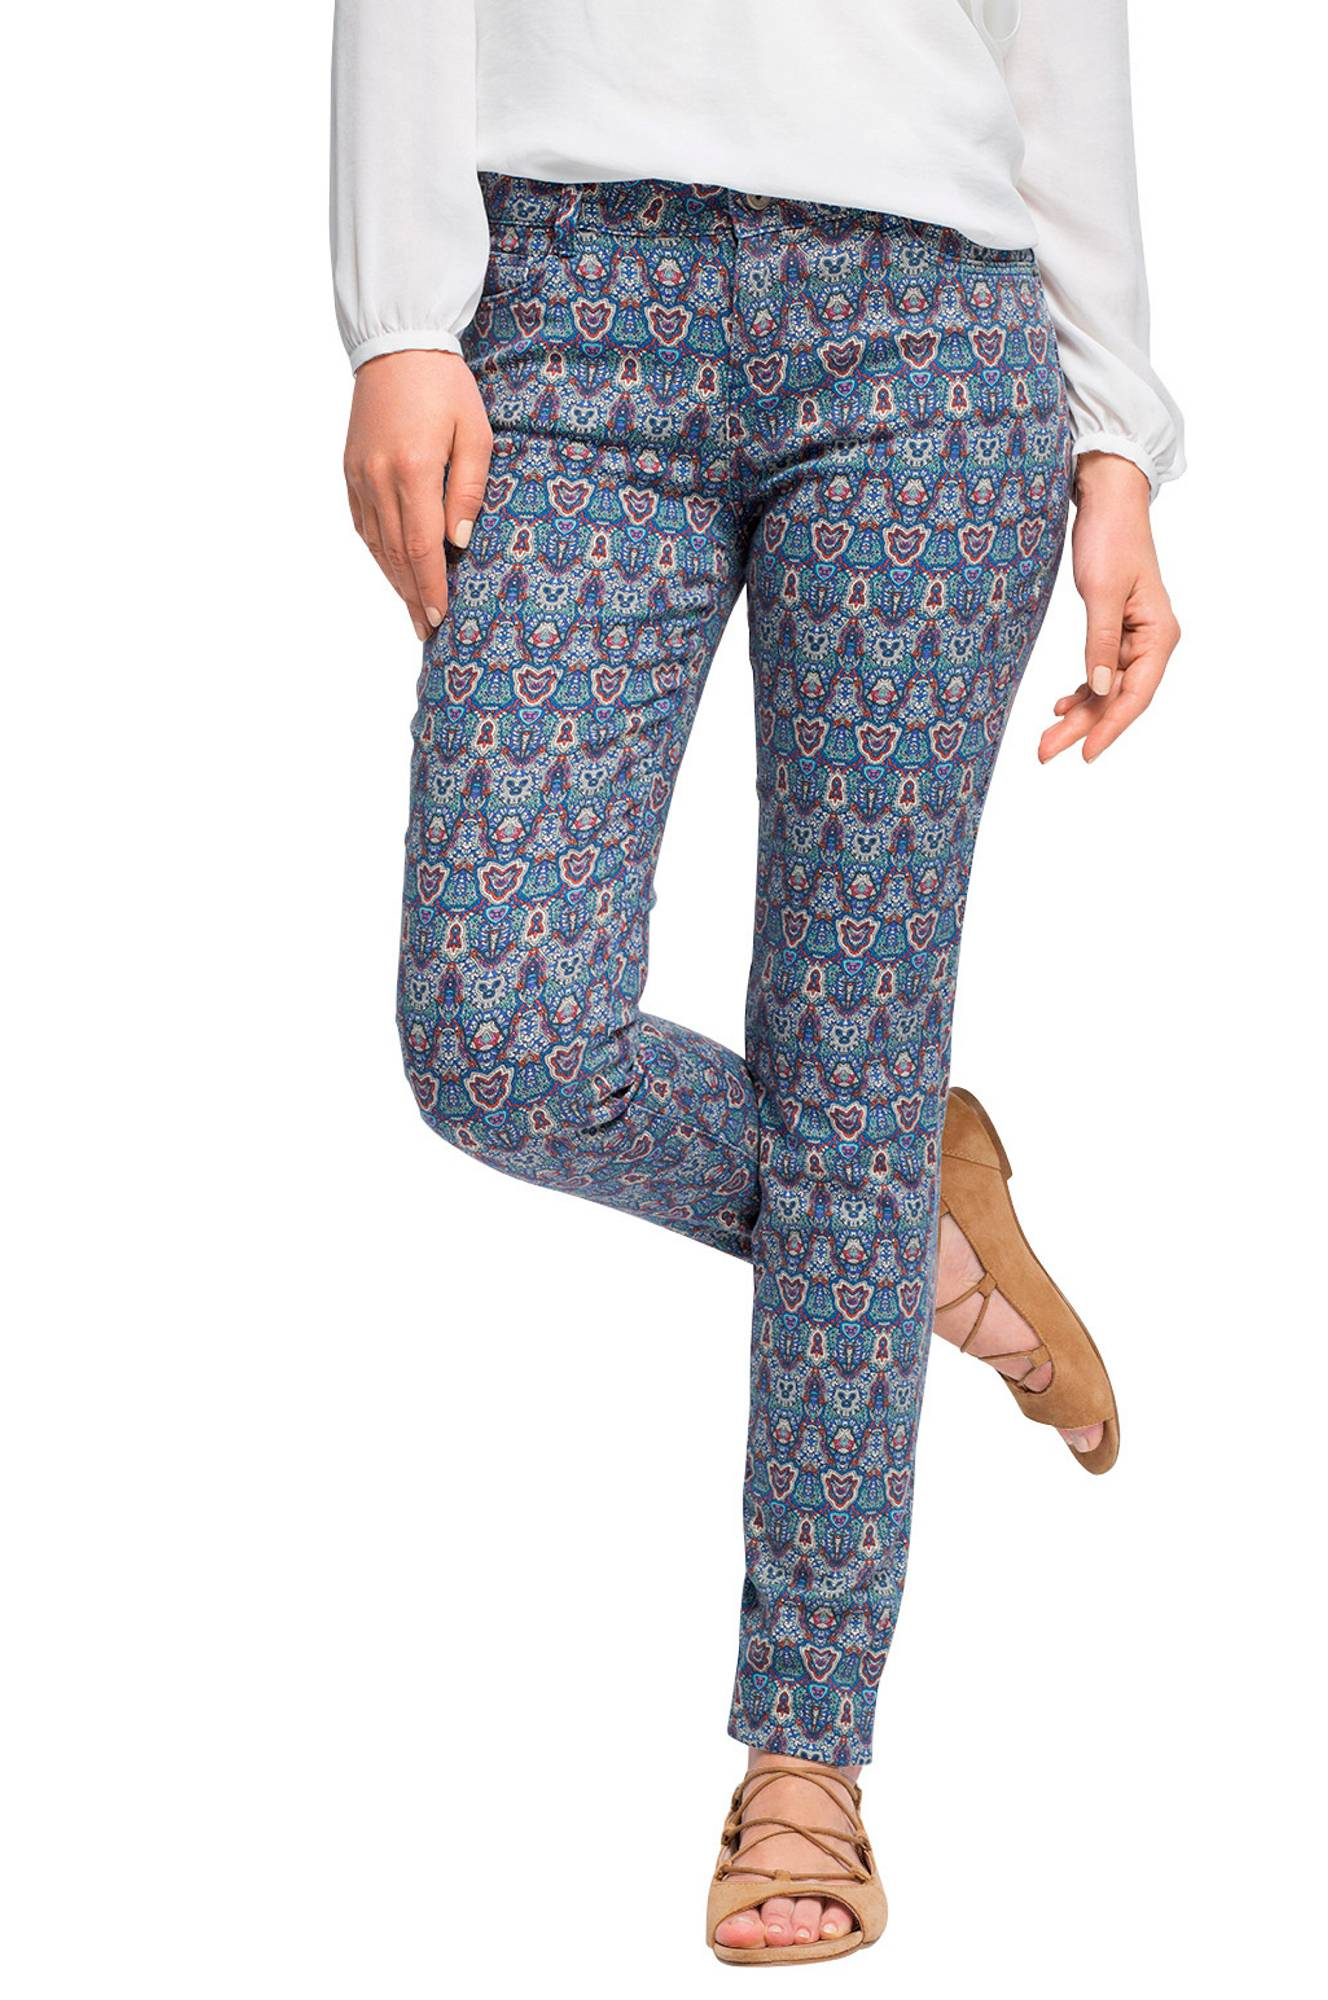 Kuviolliset housut, slim fit